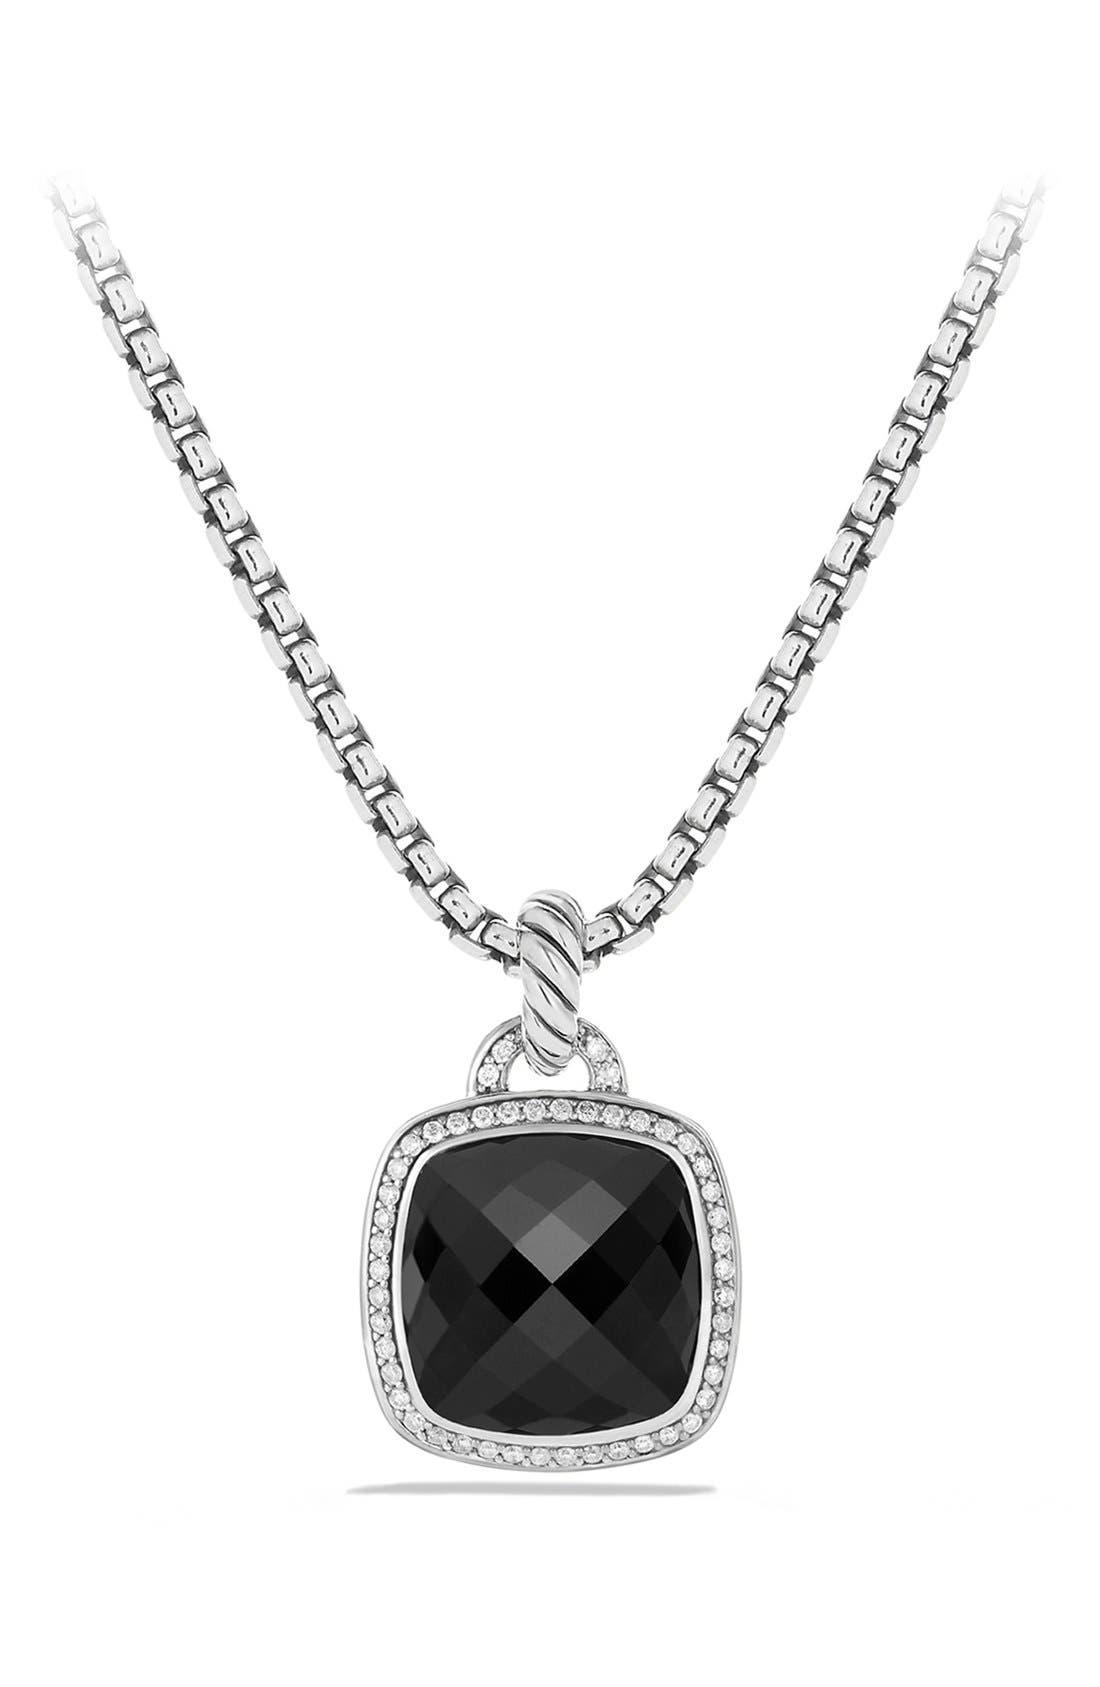 Alternate Image 1 Selected - David Yurman 'Albion' Pendant with Semiprecious Stone and Diamonds